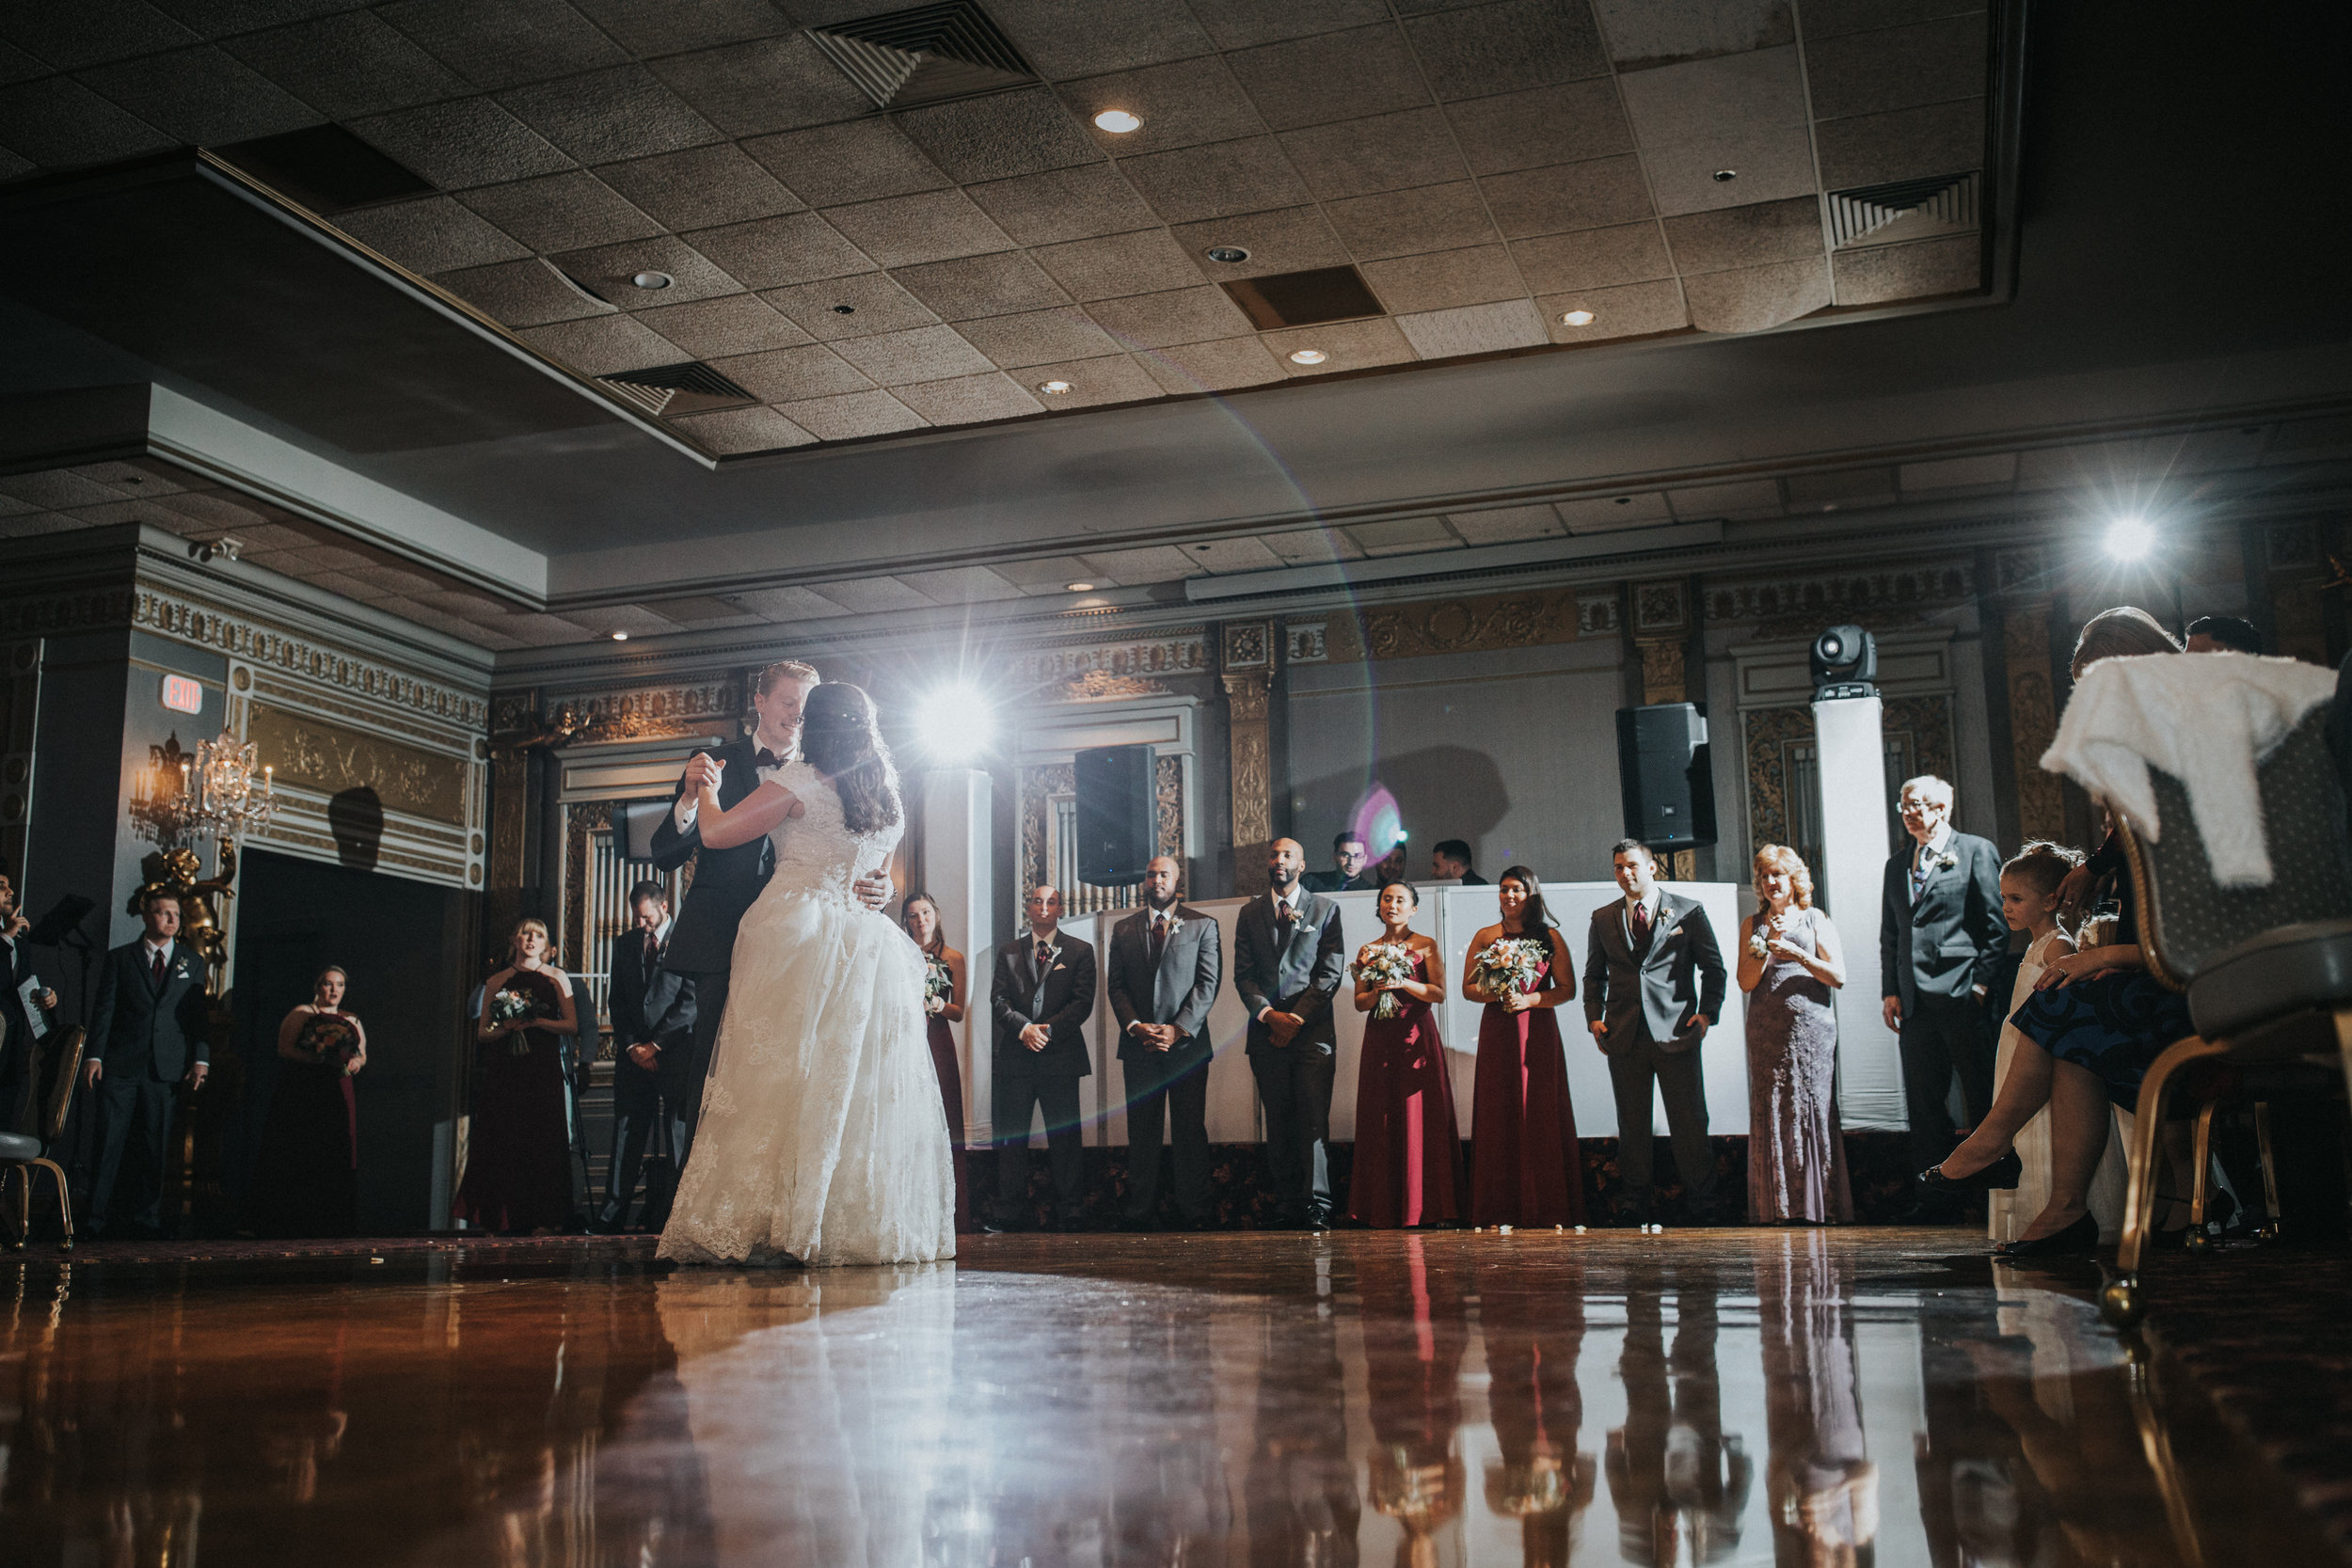 New-Jersey-Wedding-Photography-Fishers-Tudor-House-JennaLynnPhotography-Reception-Kathleen&Eddie-21.jpg